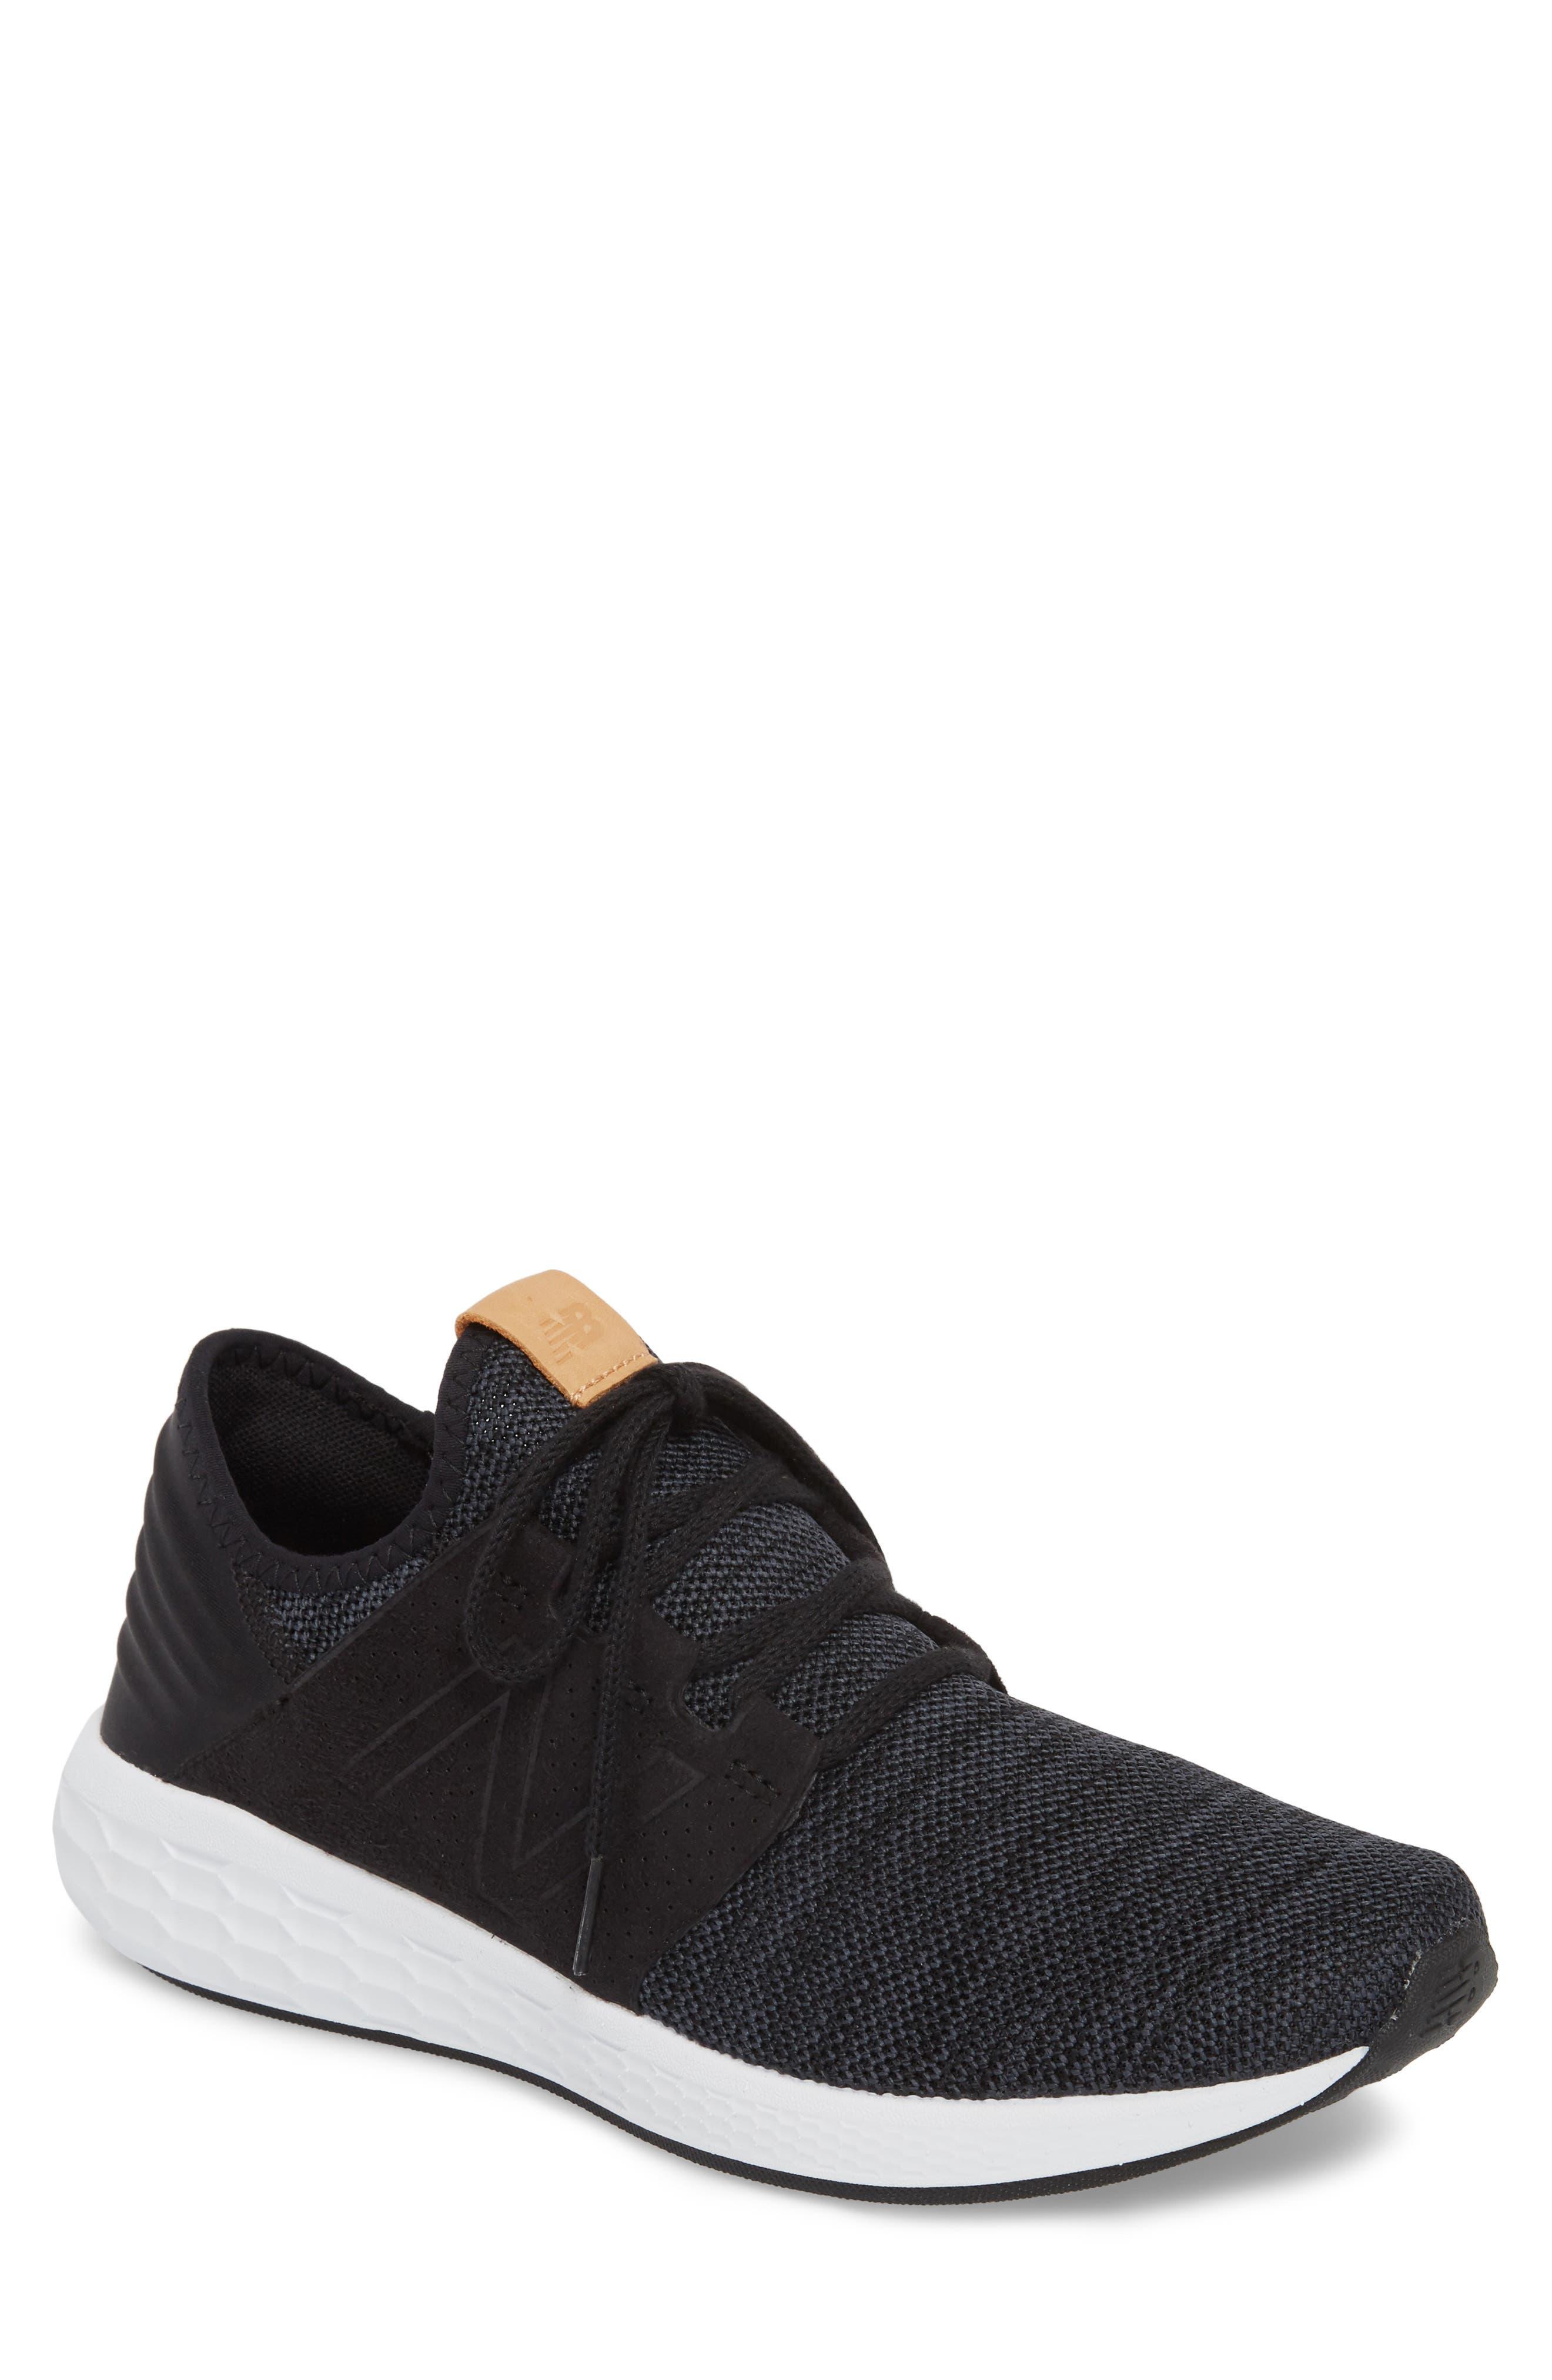 Fresh Foam Cruz v2 Knit Running Shoe,                             Main thumbnail 1, color,                             Black/ White